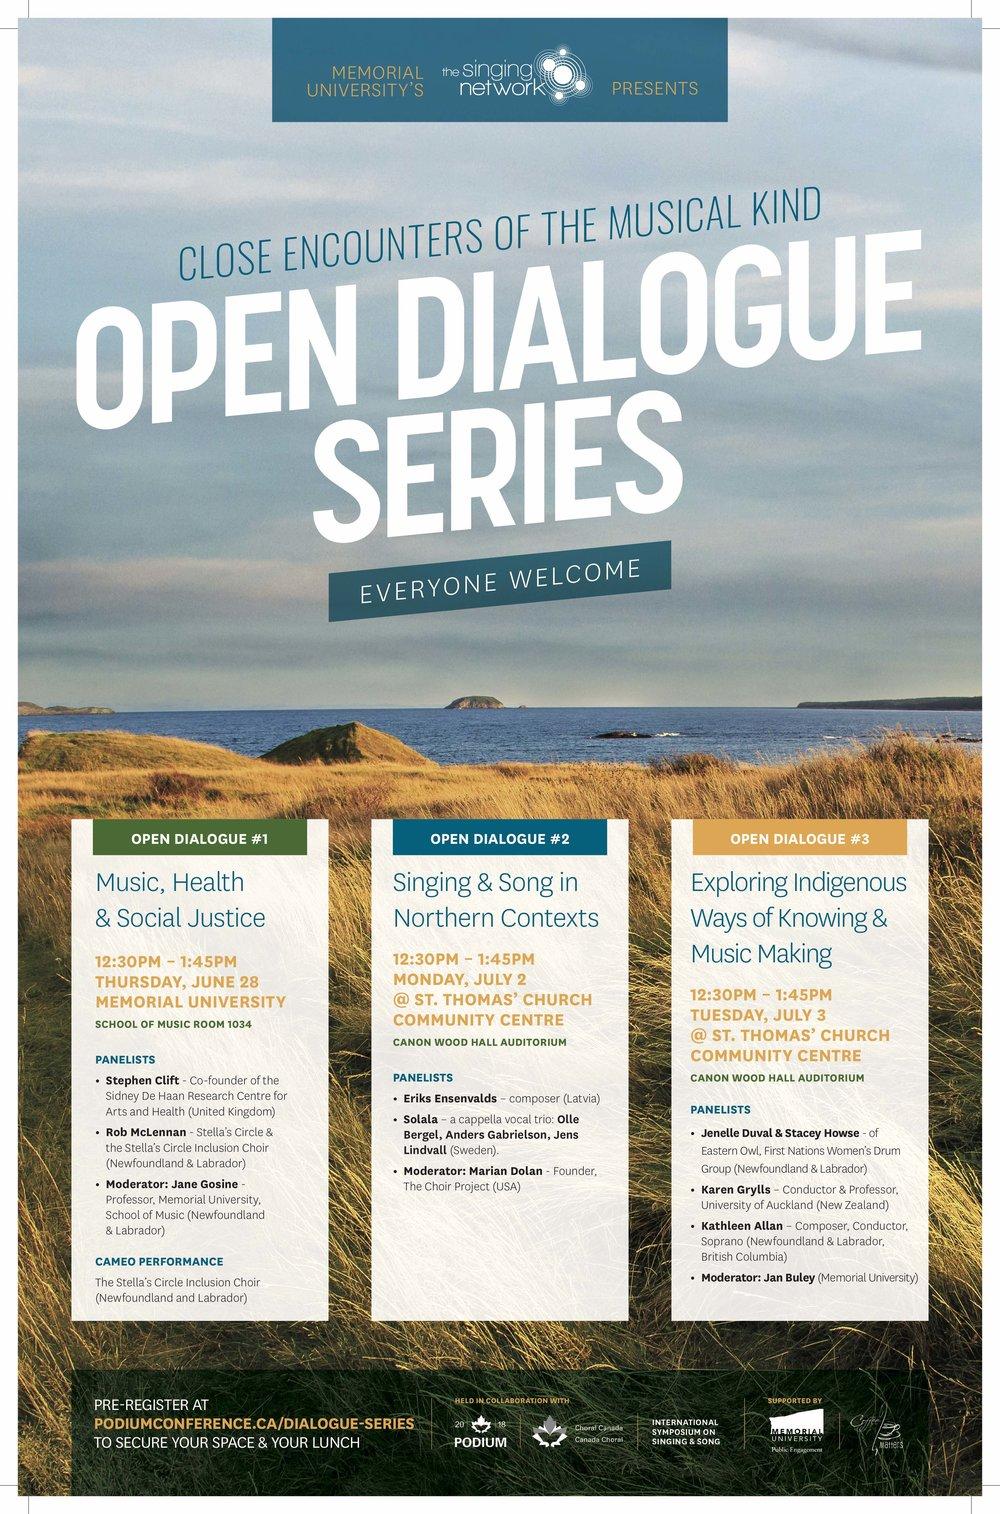 Podium Dialogue Series - Poster RFA v2.jpg